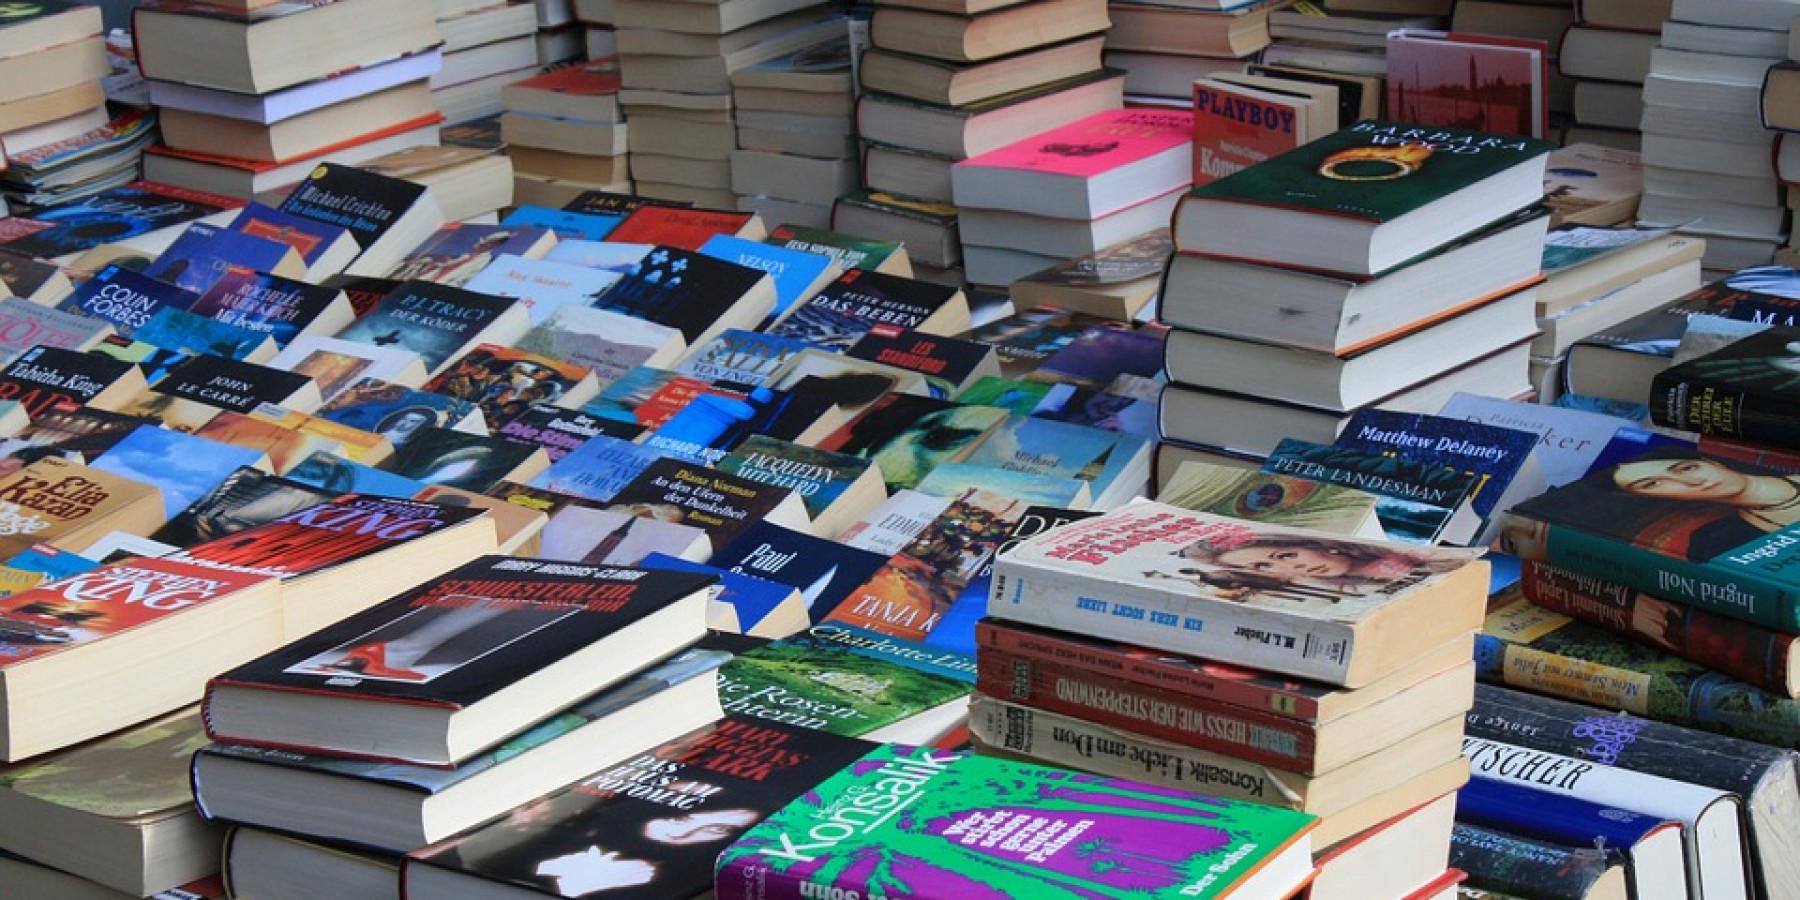 Stadtbücherei verlängert Leihfristen bis 22. April